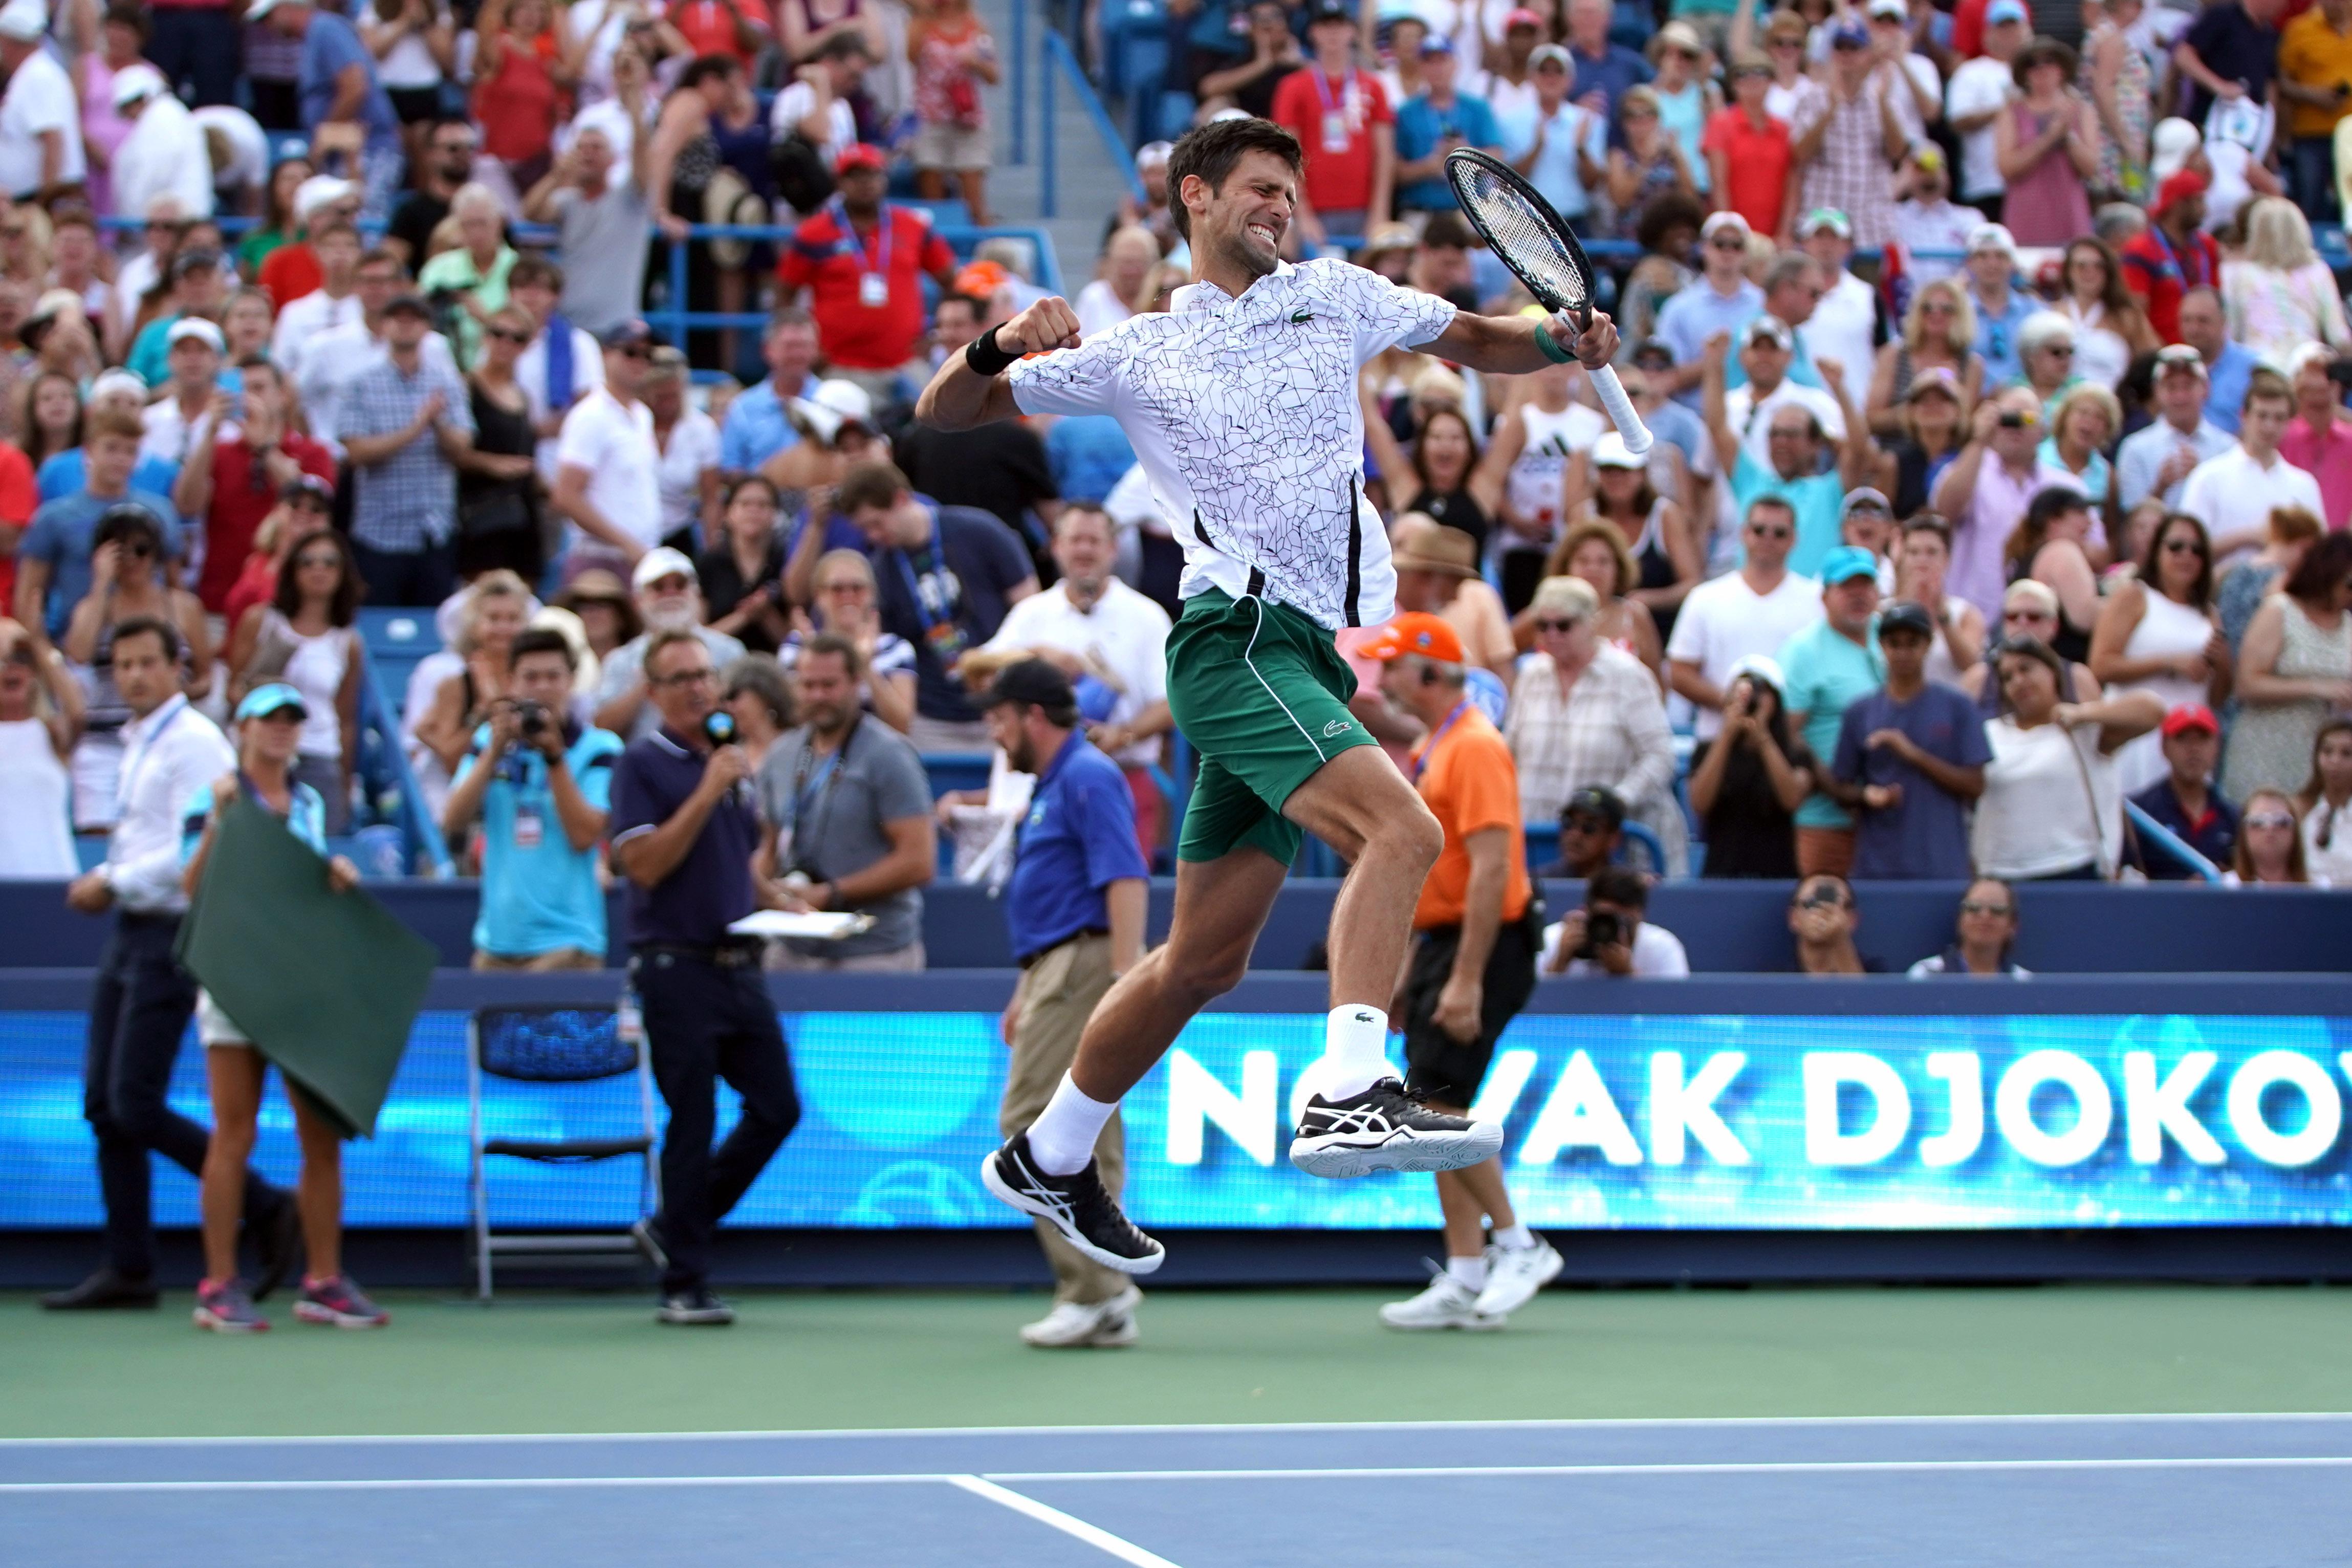 Tennis - ATP - A Cincinnati, Novak Djokovic est entré dans l'histoire